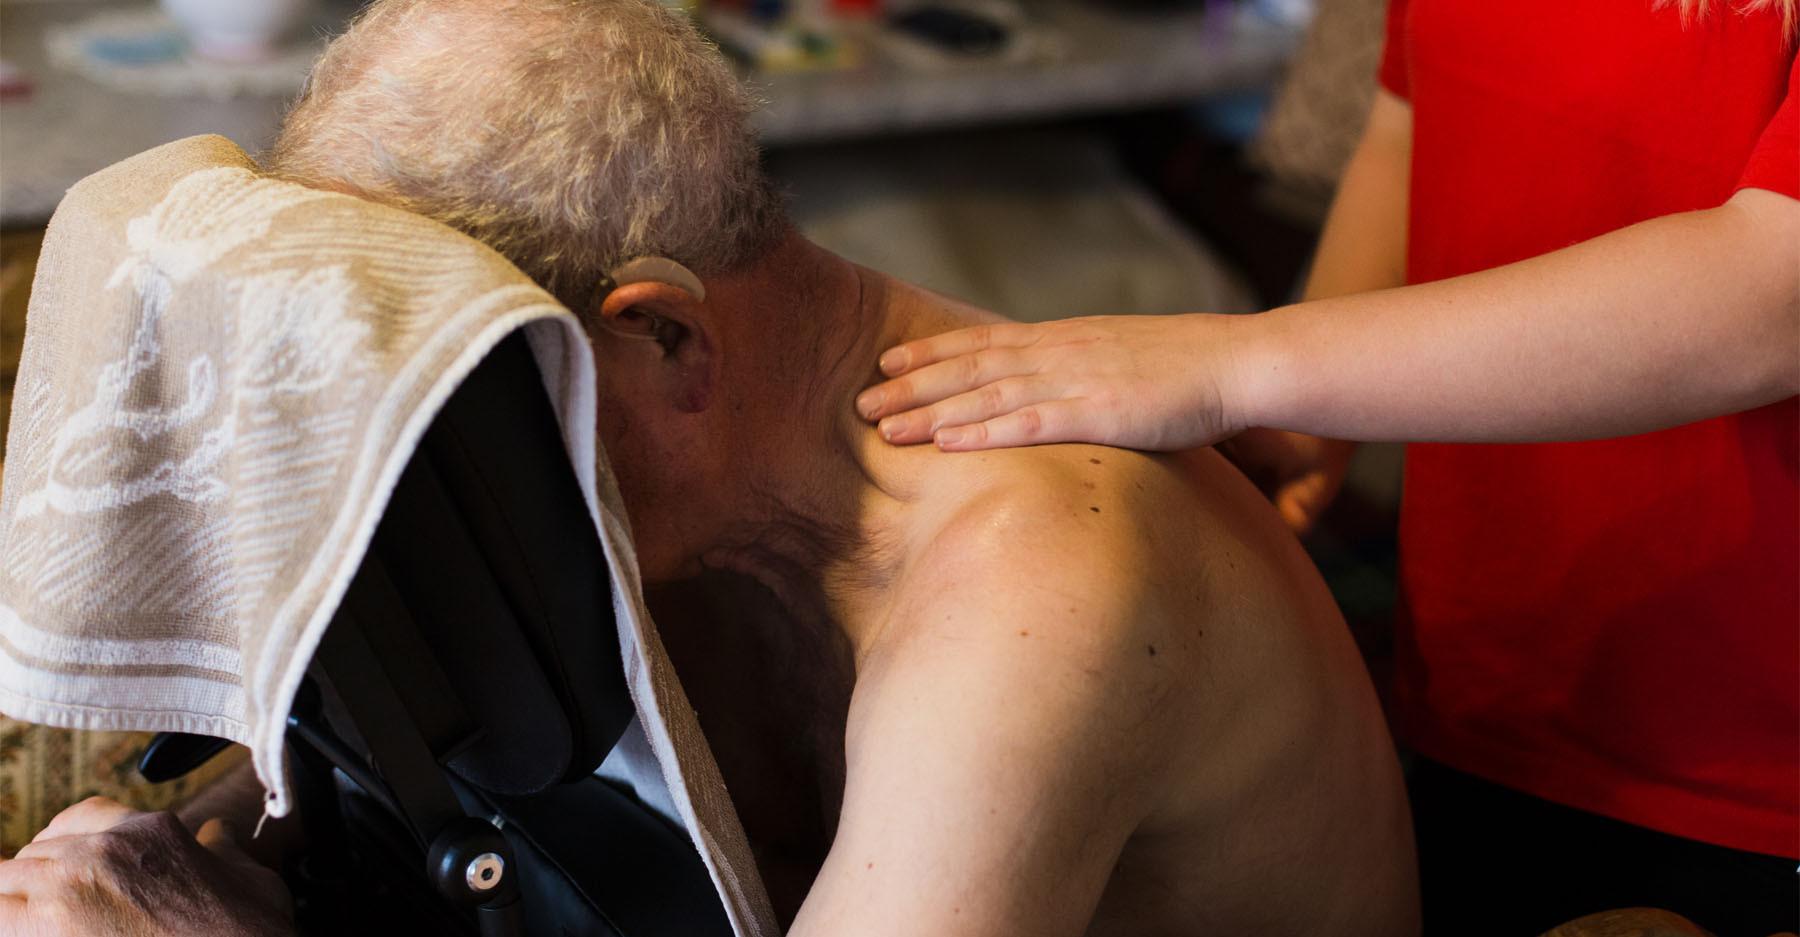 Hauskrankenpflege Dori Massage